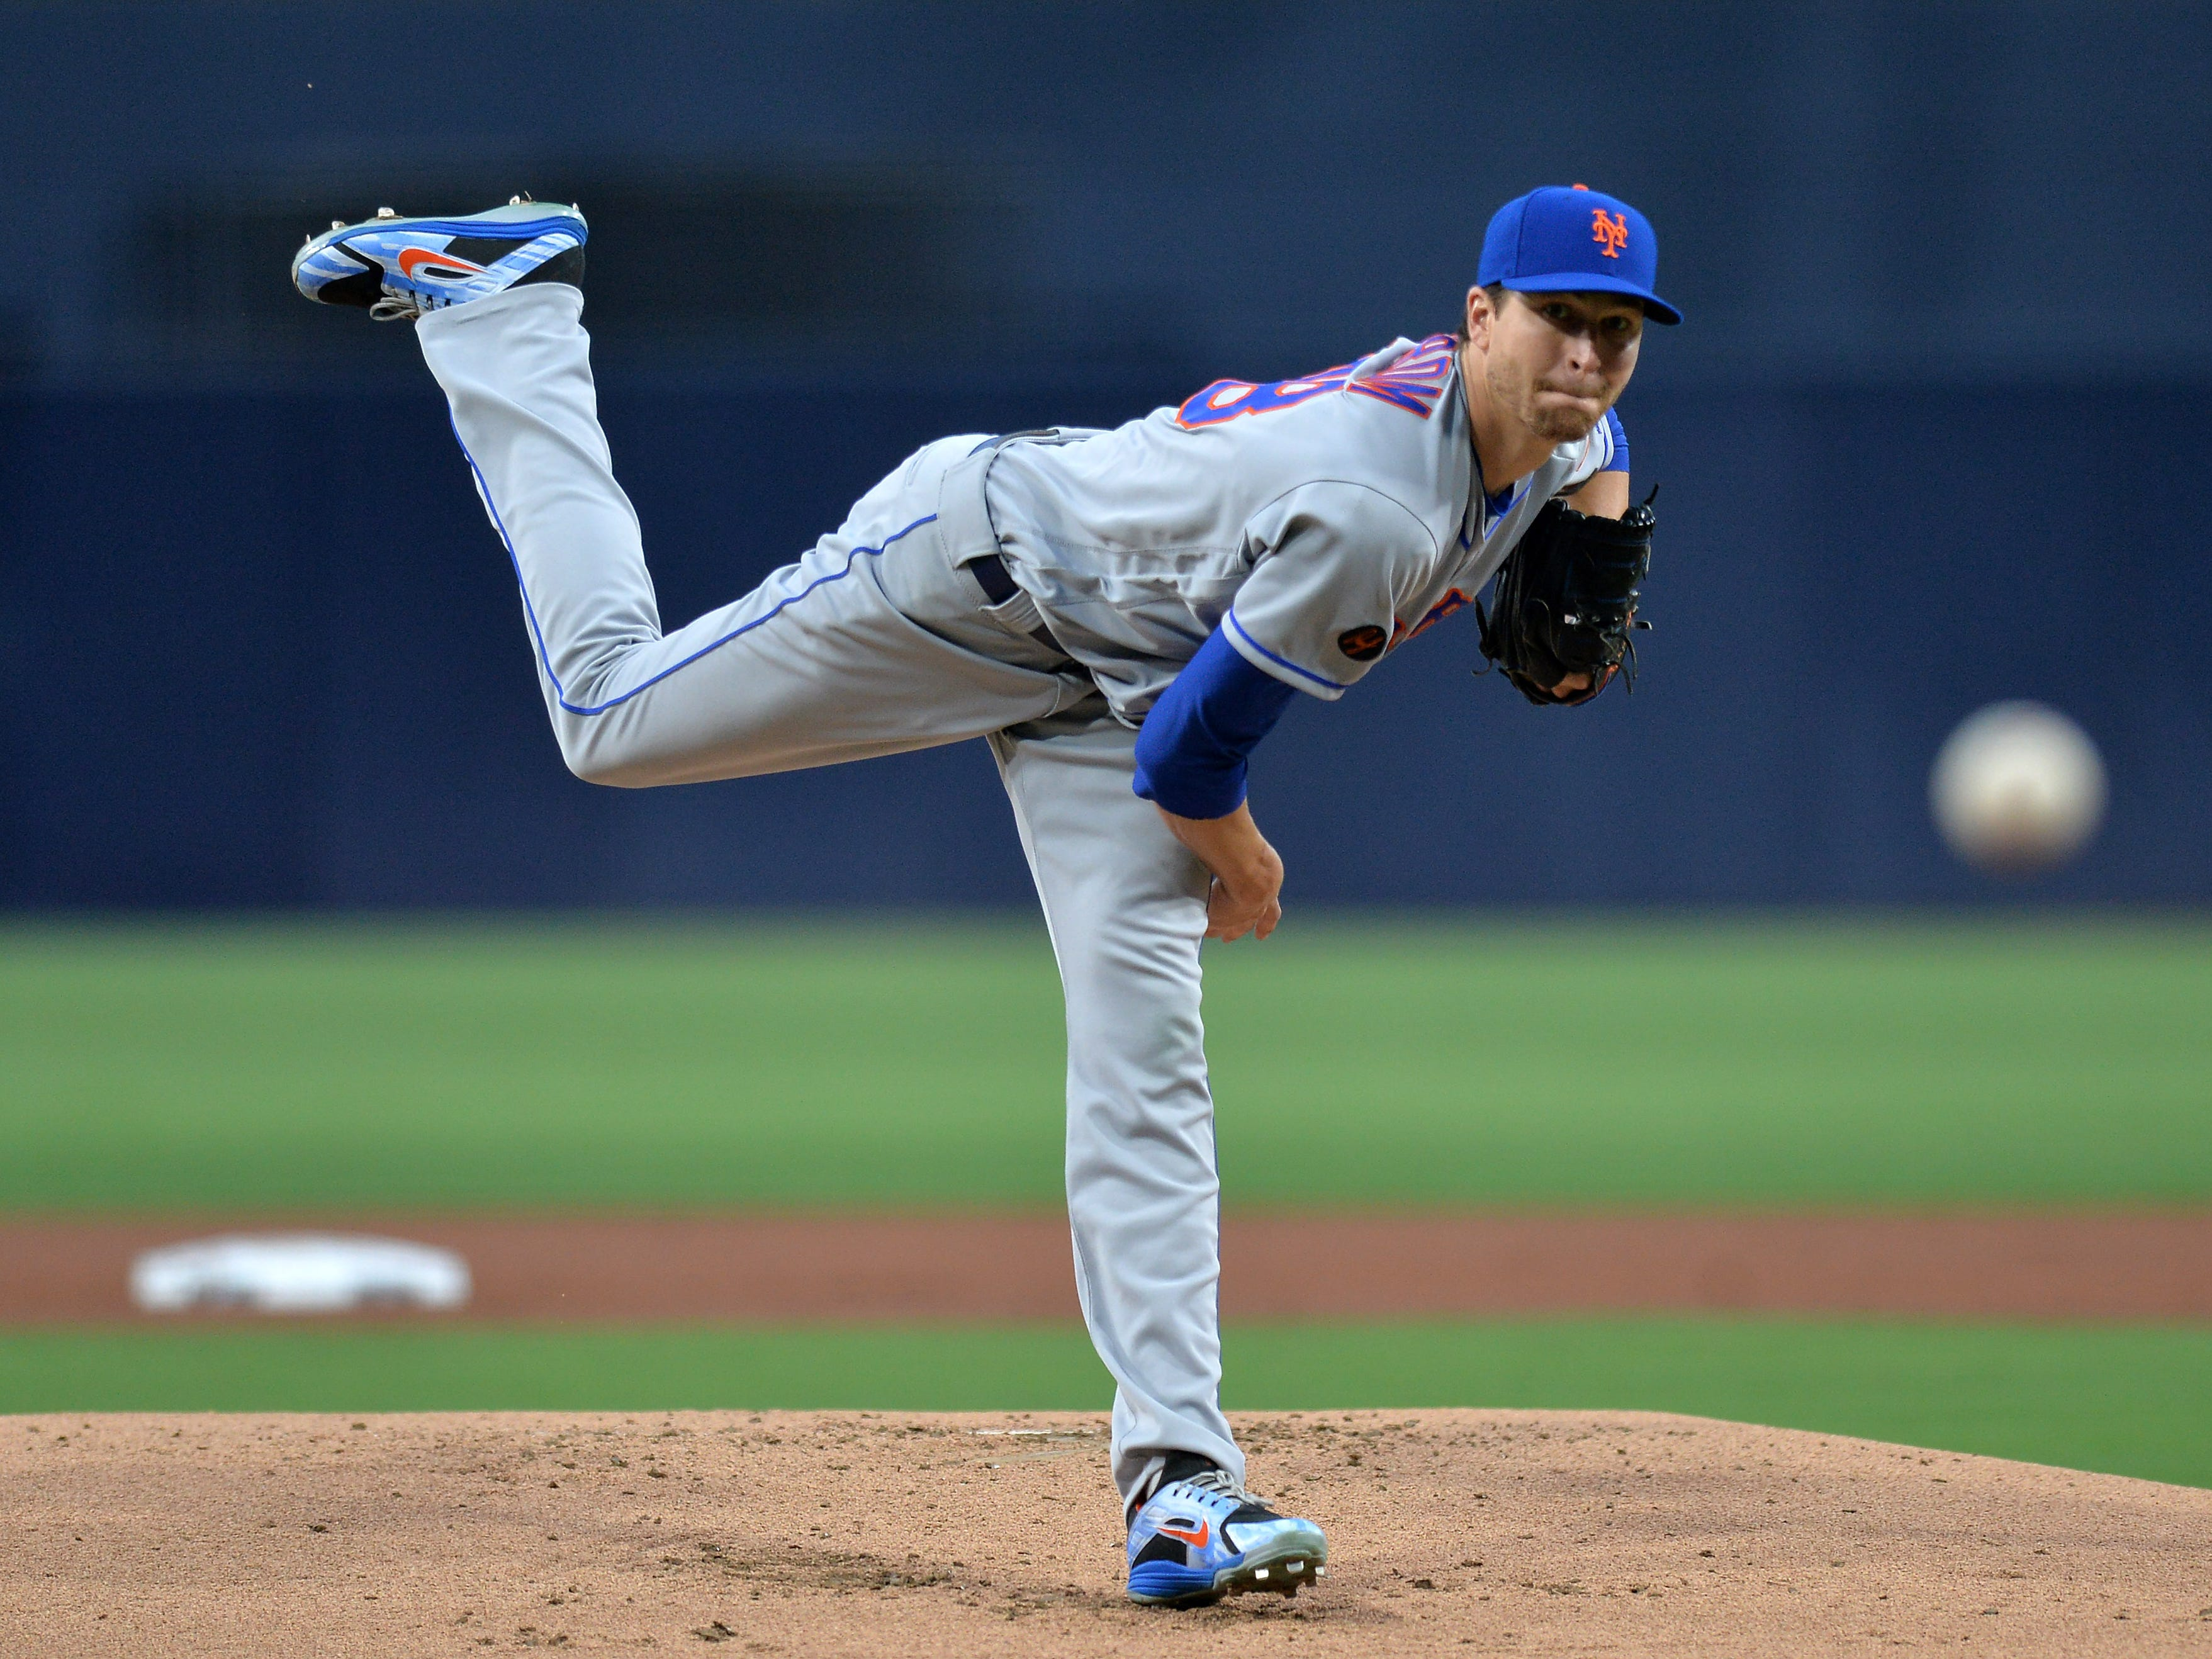 RHP Jacob deGrom, Mets